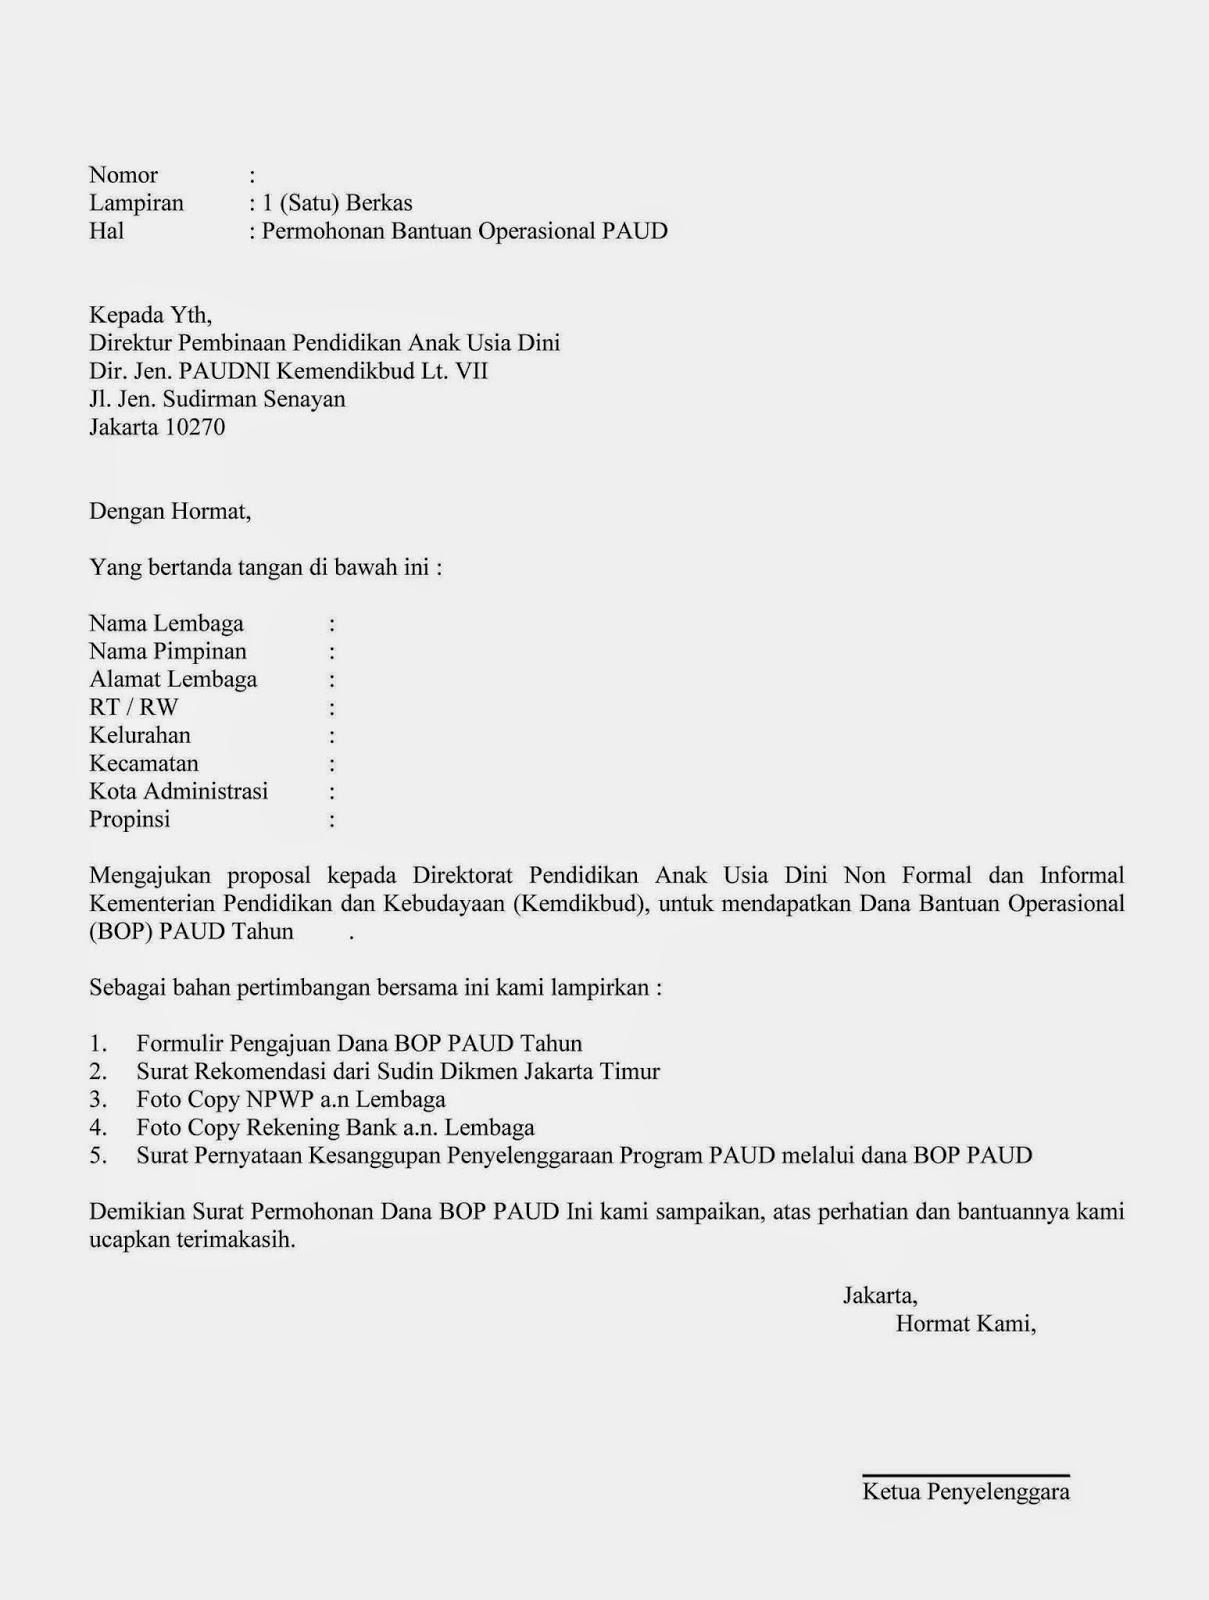 Contoh Surat Permohonan Bantuan Operasional Bop Paud Wisanggeni